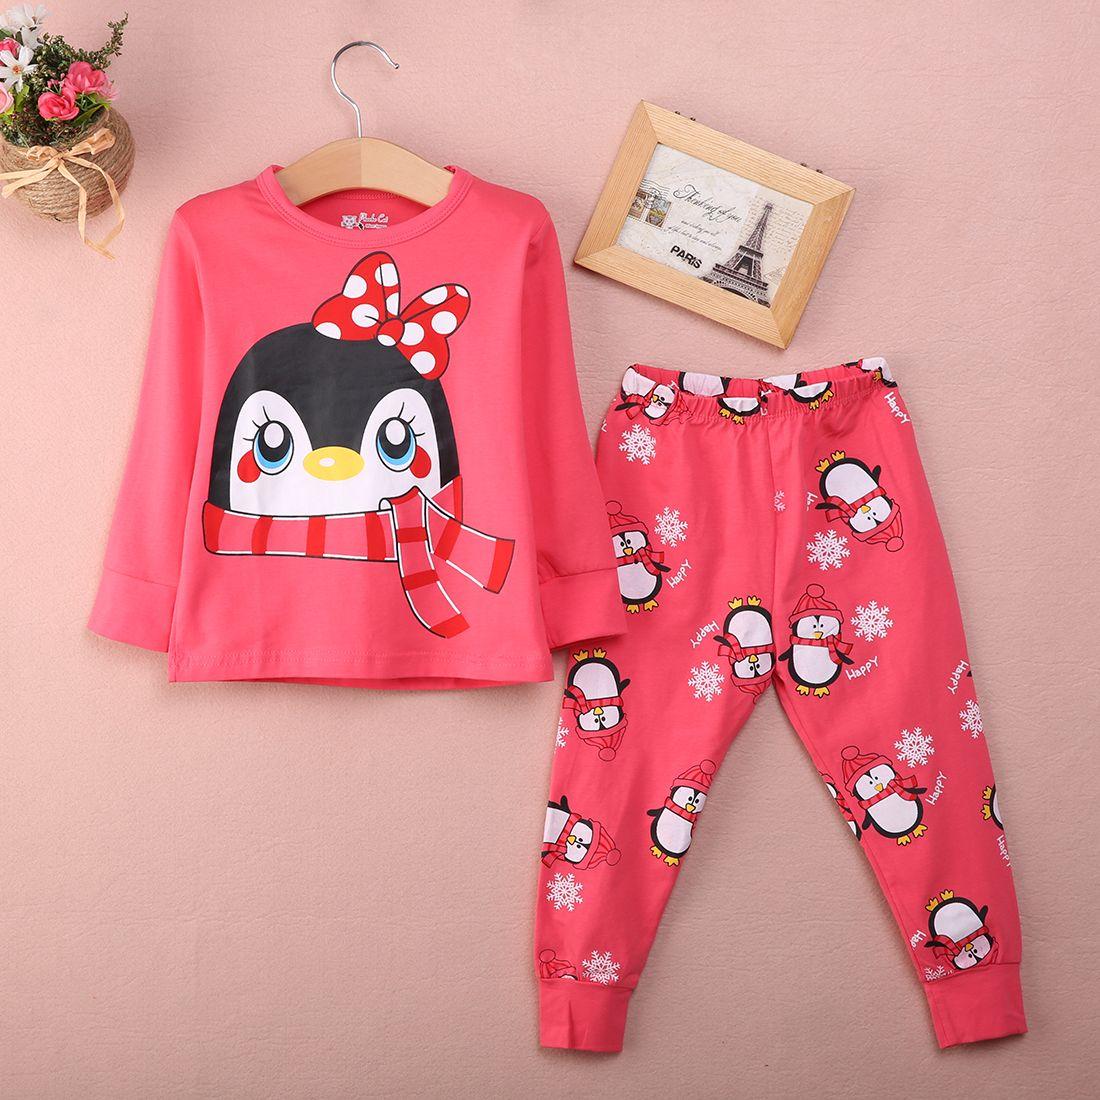 05205dcf7 2017 New Fashion Cute Baby Girl Kids Red Tops Pants Sleepwear ...